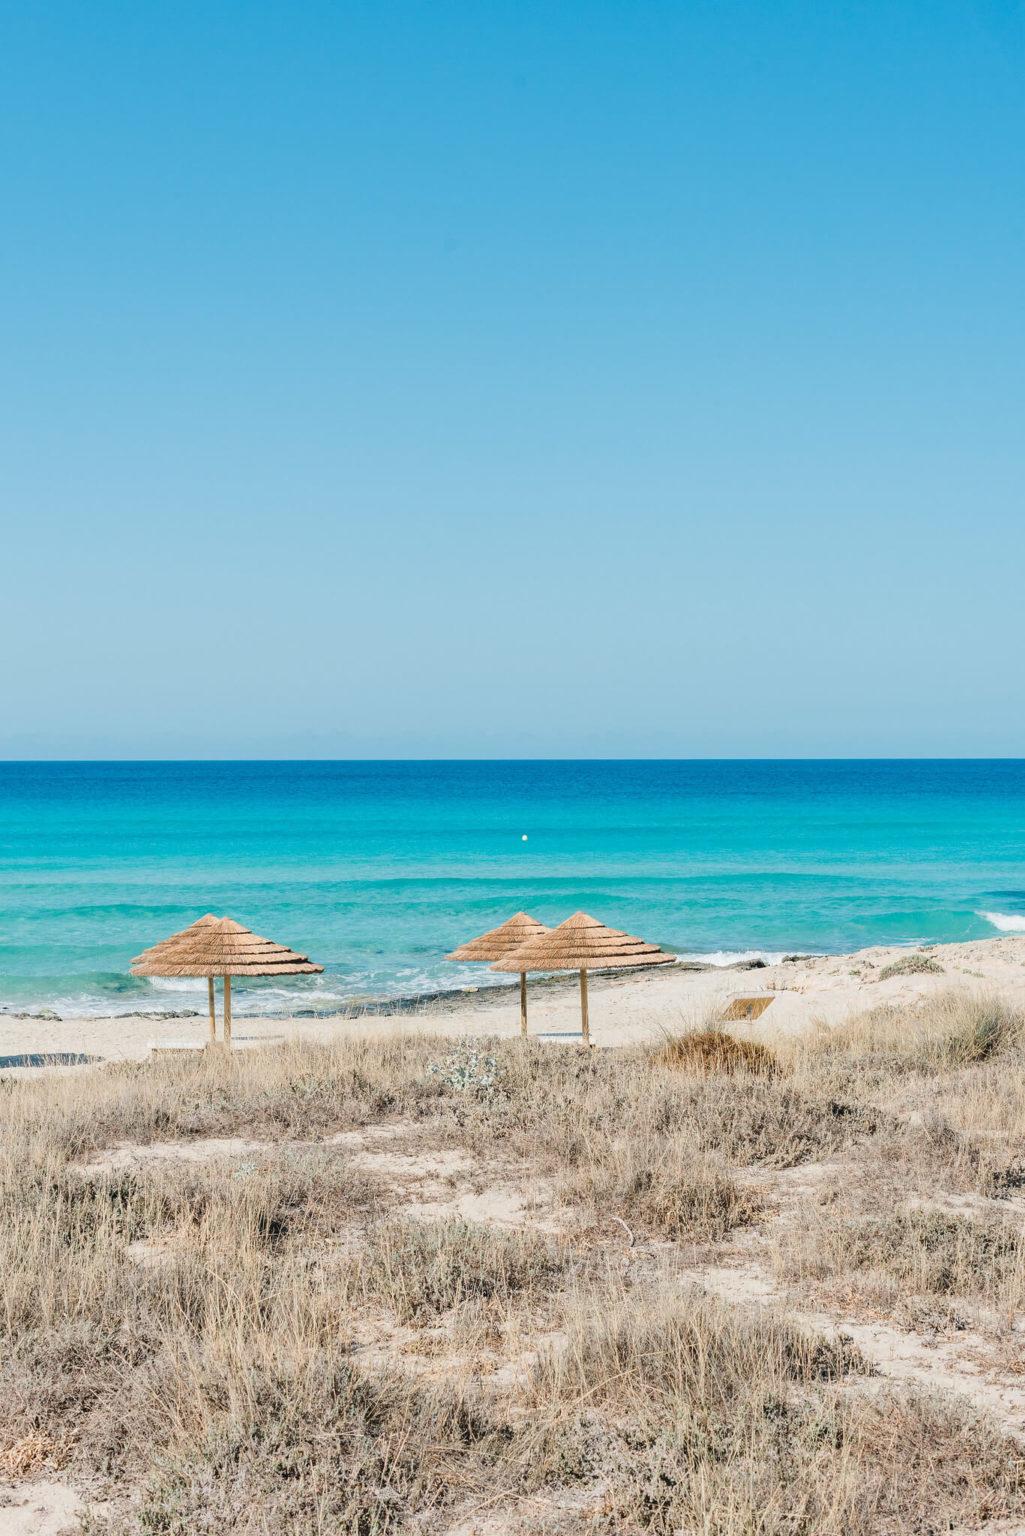 https://www.white-ibiza.com/wp-content/uploads/2020/03/formentera-beach-restaurants-flipper-2020-03-1025x1536.jpg